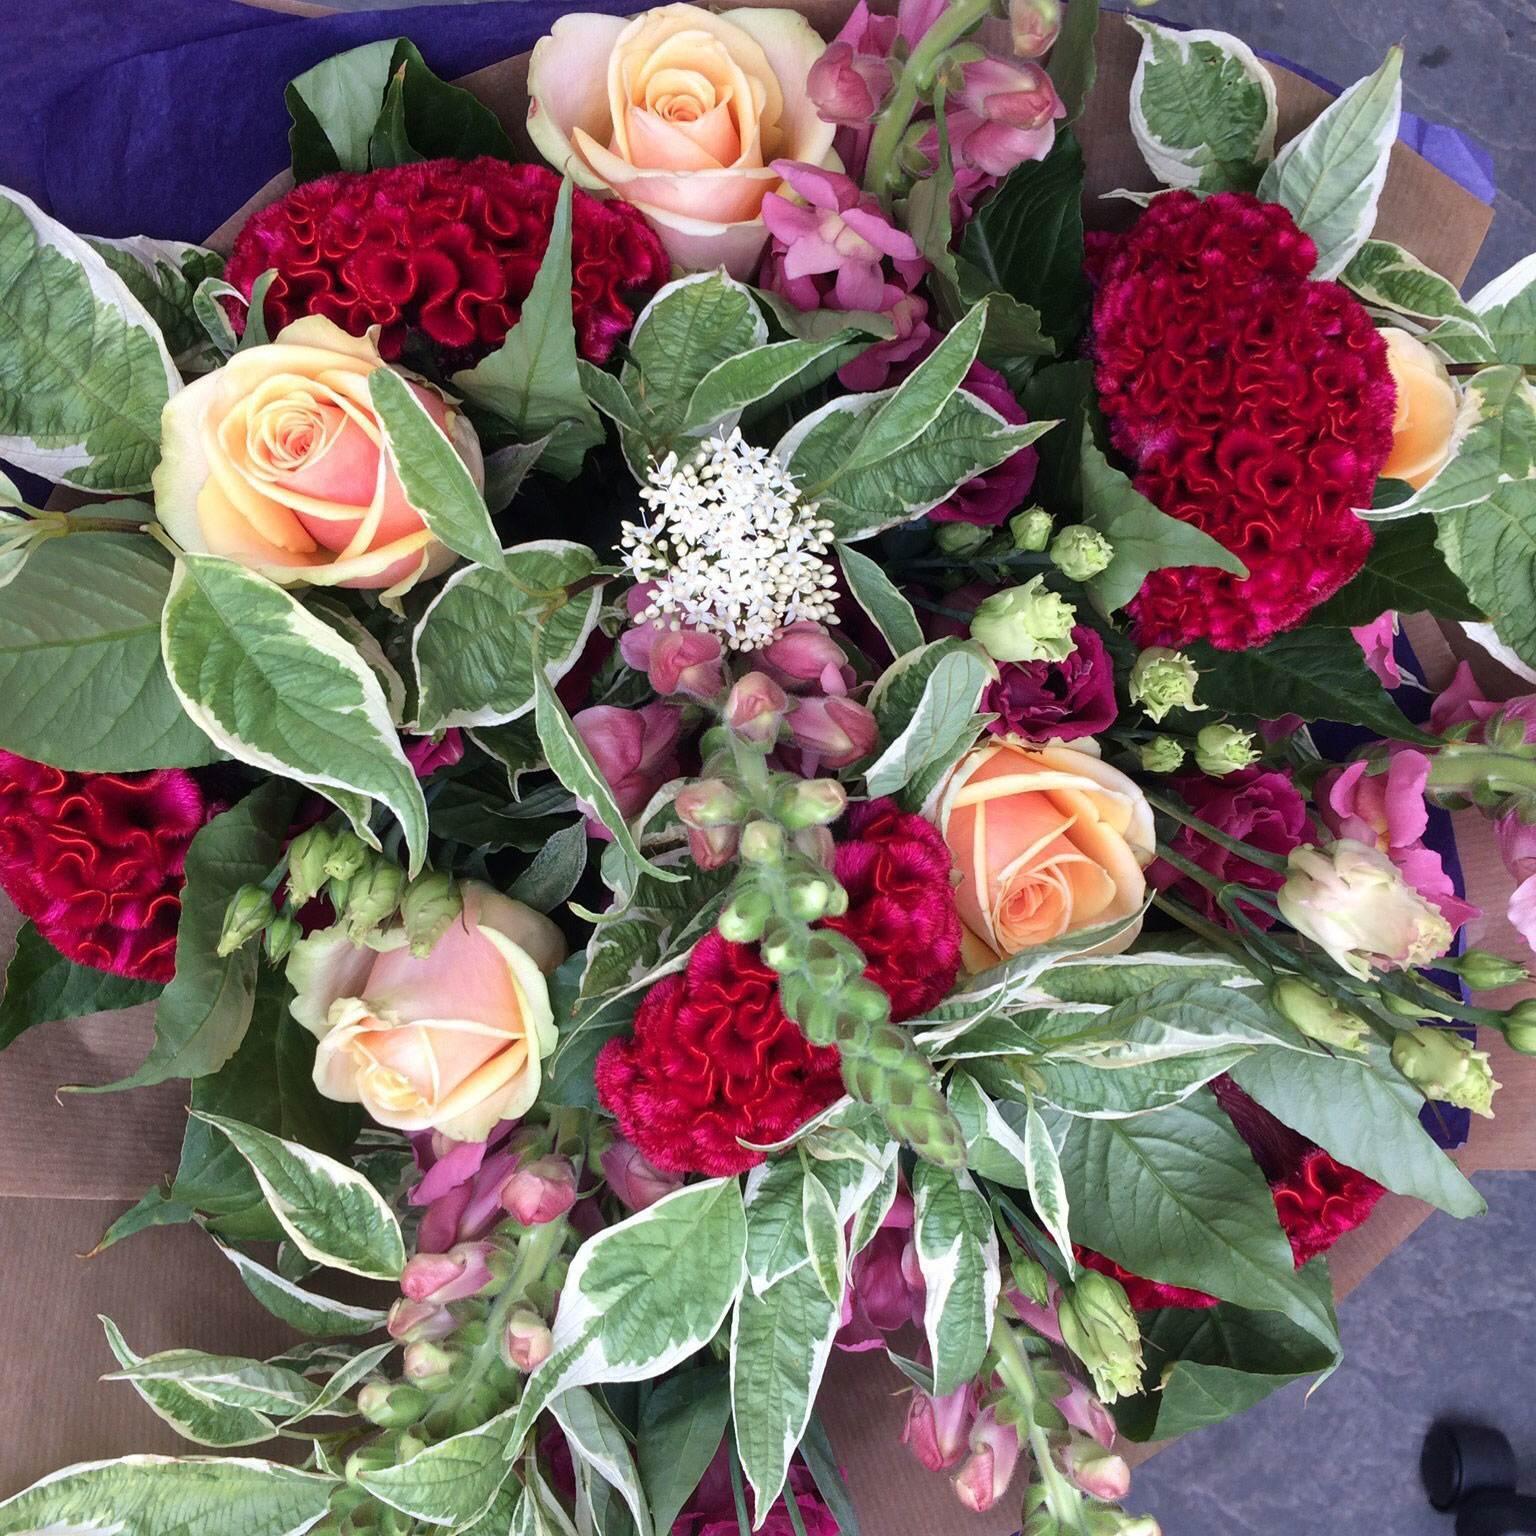 Artisans florists 'Floriology' return